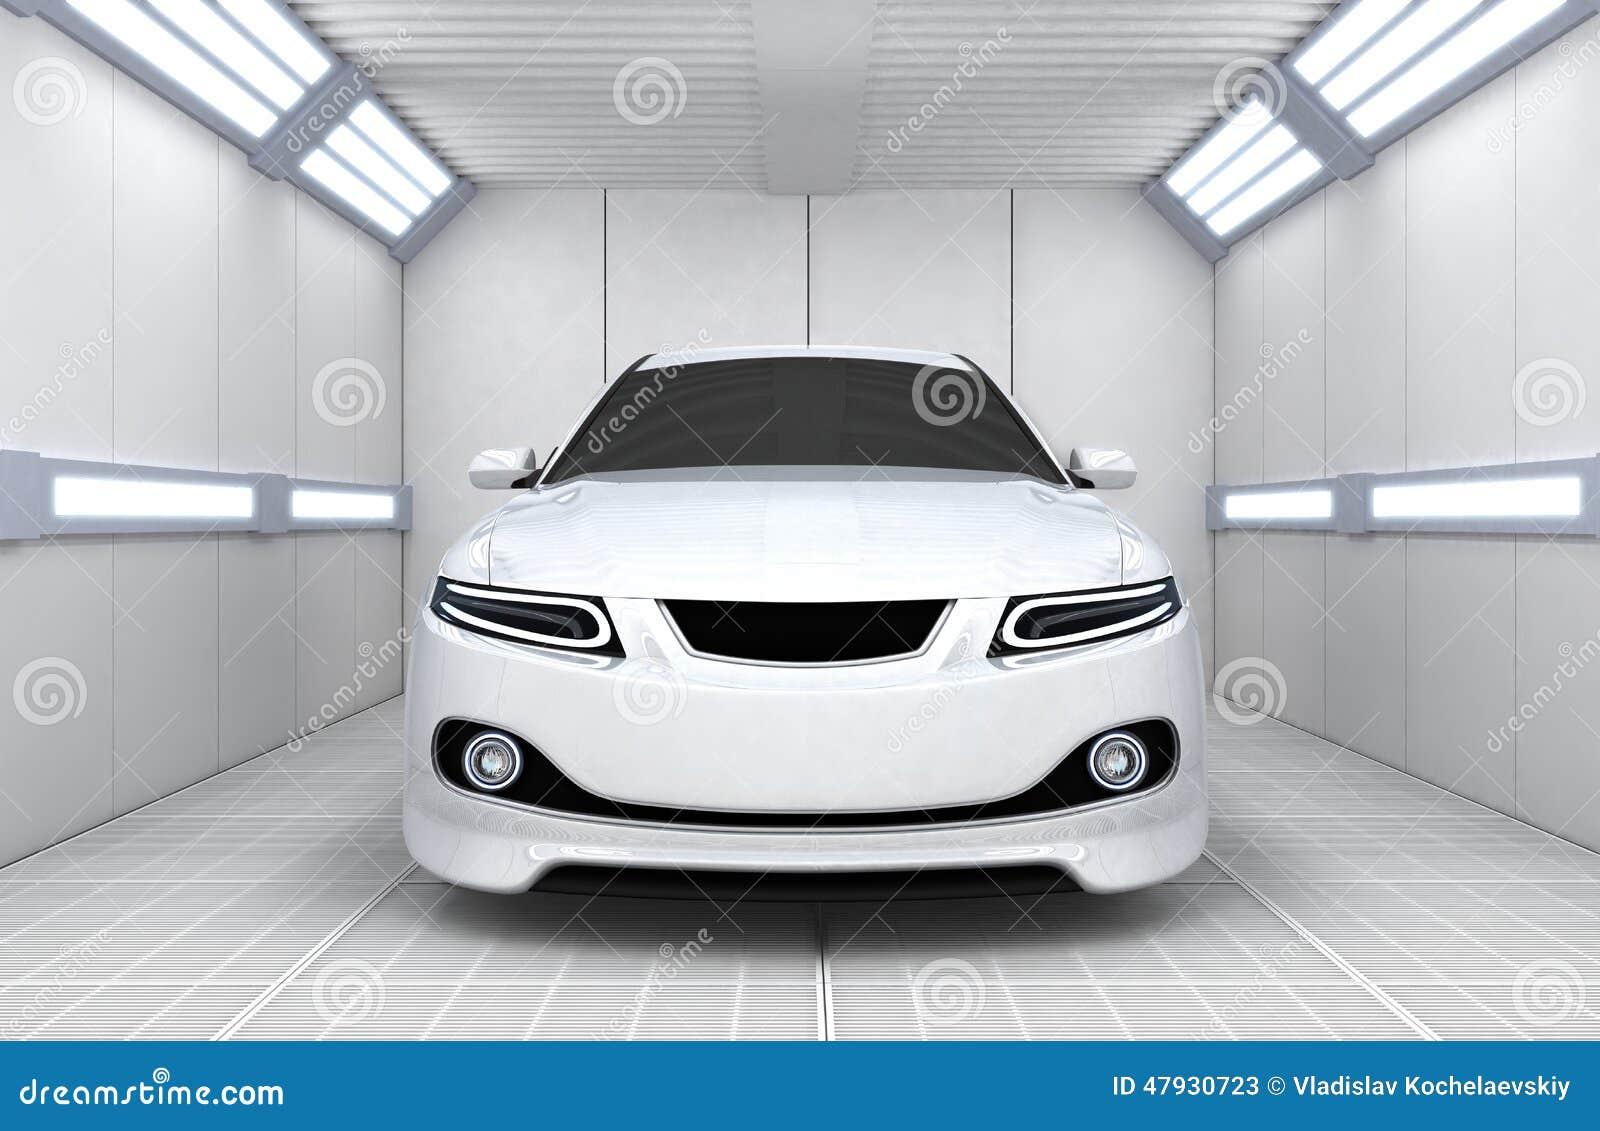 Dejlig Bil i garage stock illustrationer. Illustration av medel - 47930723 UT-26